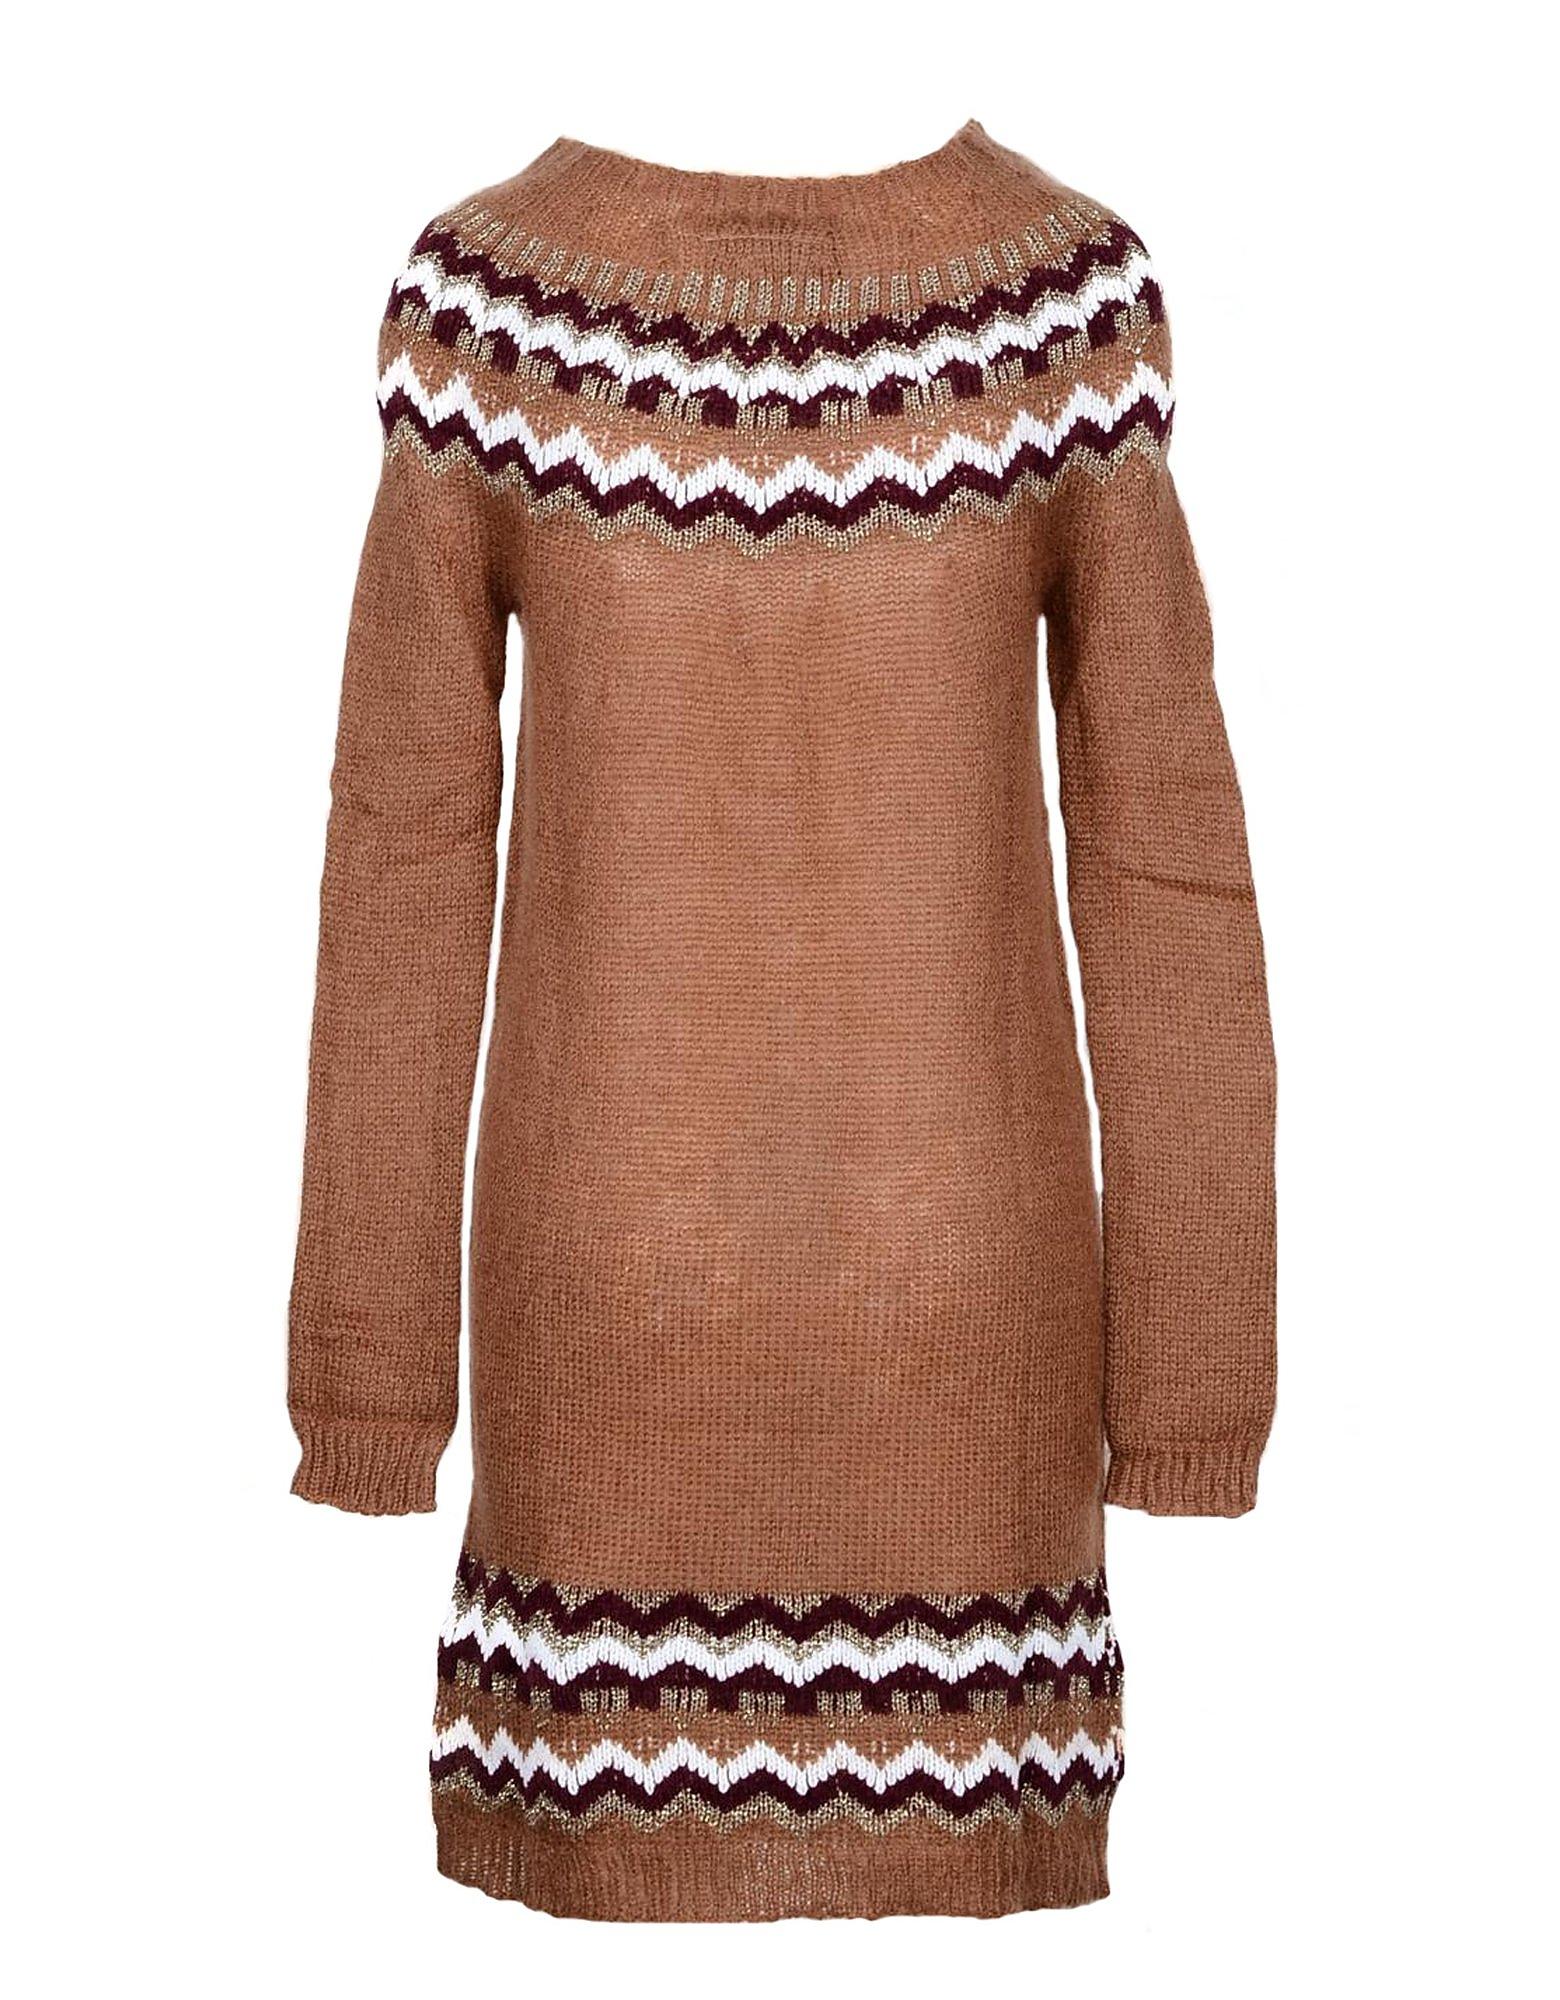 Pink Memories Designer Dresses & Jumpsuits, Brown Cotton and Viscose Women's Dress